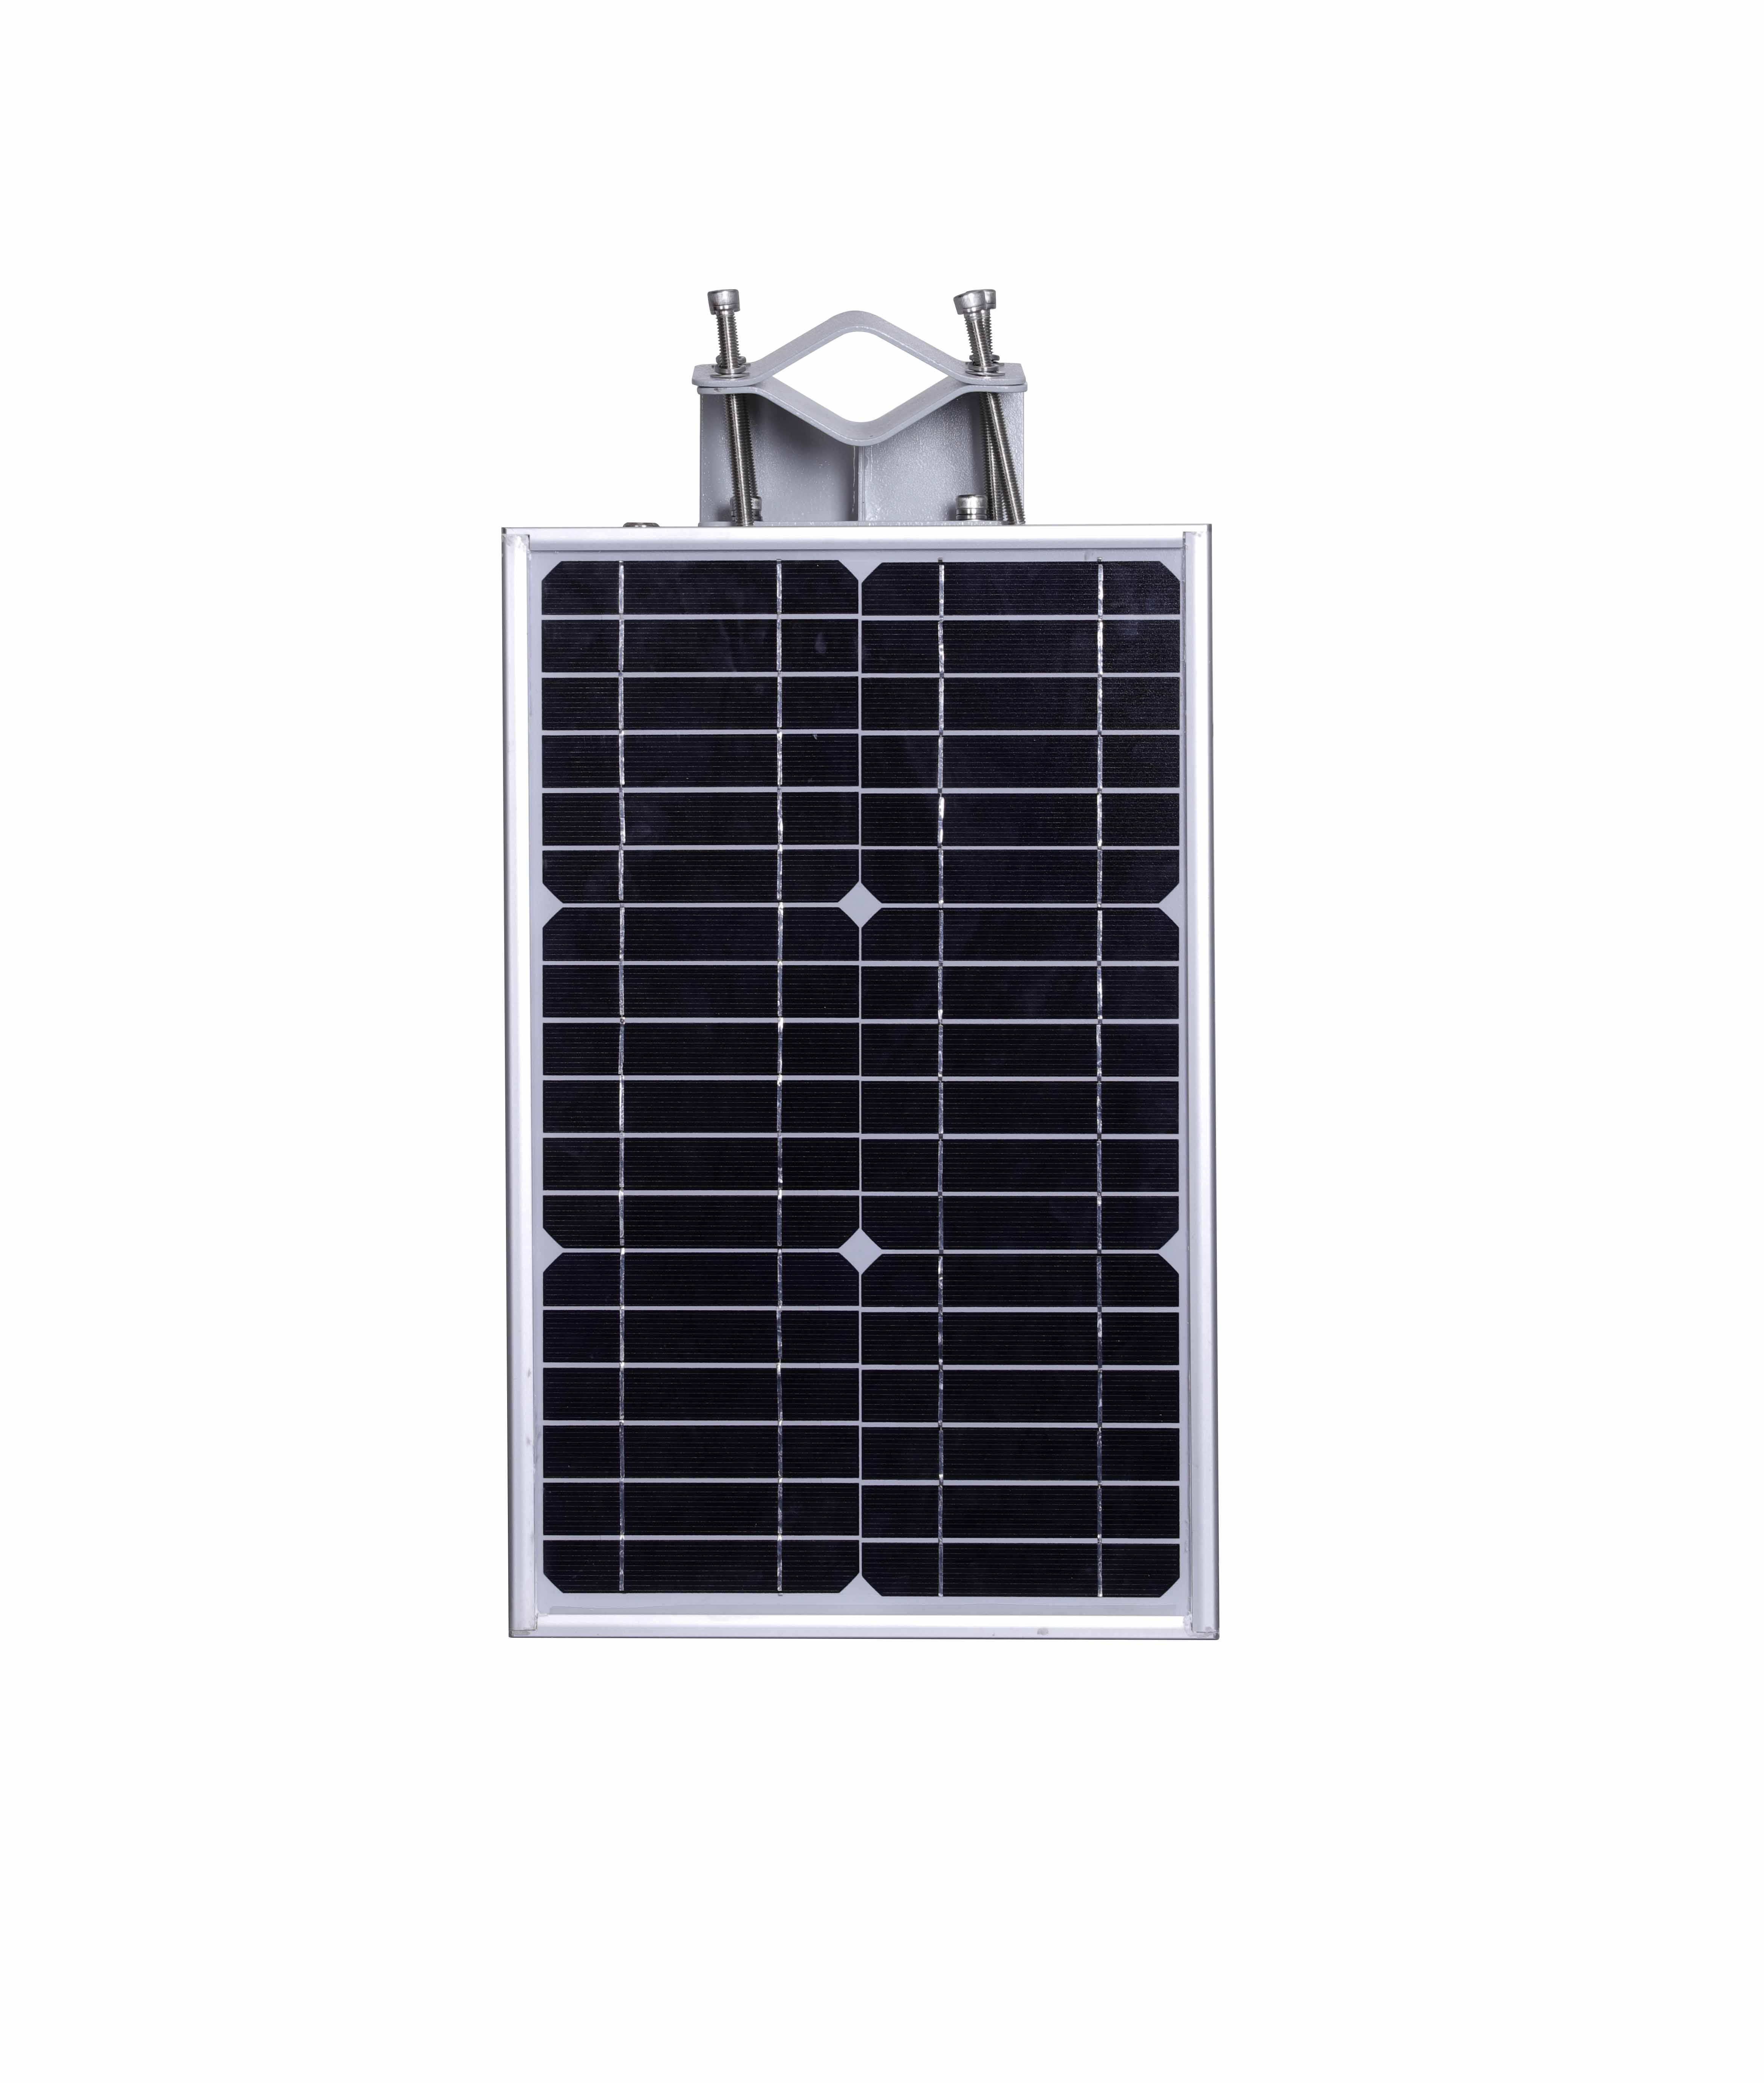 Solar-Power Foco Solar Integrado Flat 8-12W